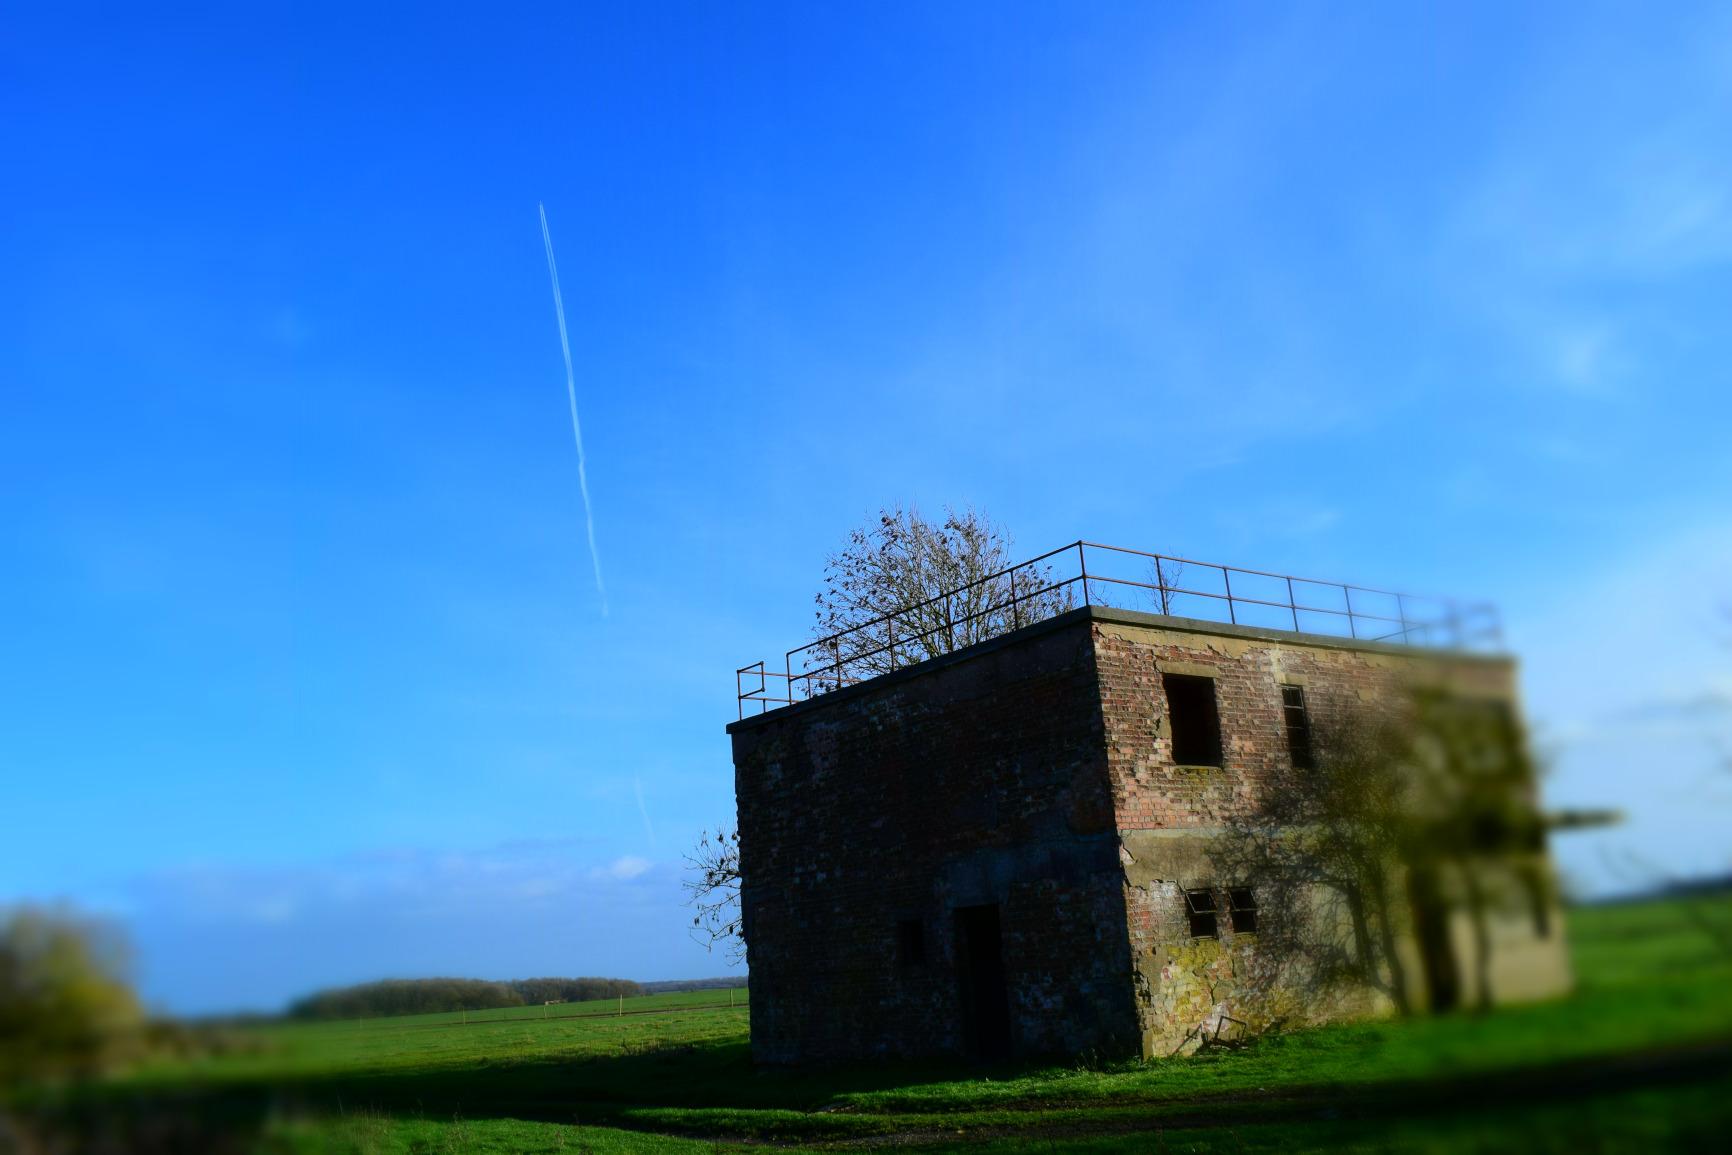 RAF Woolfox Lodge control tower flypast, Greetham, Rutland